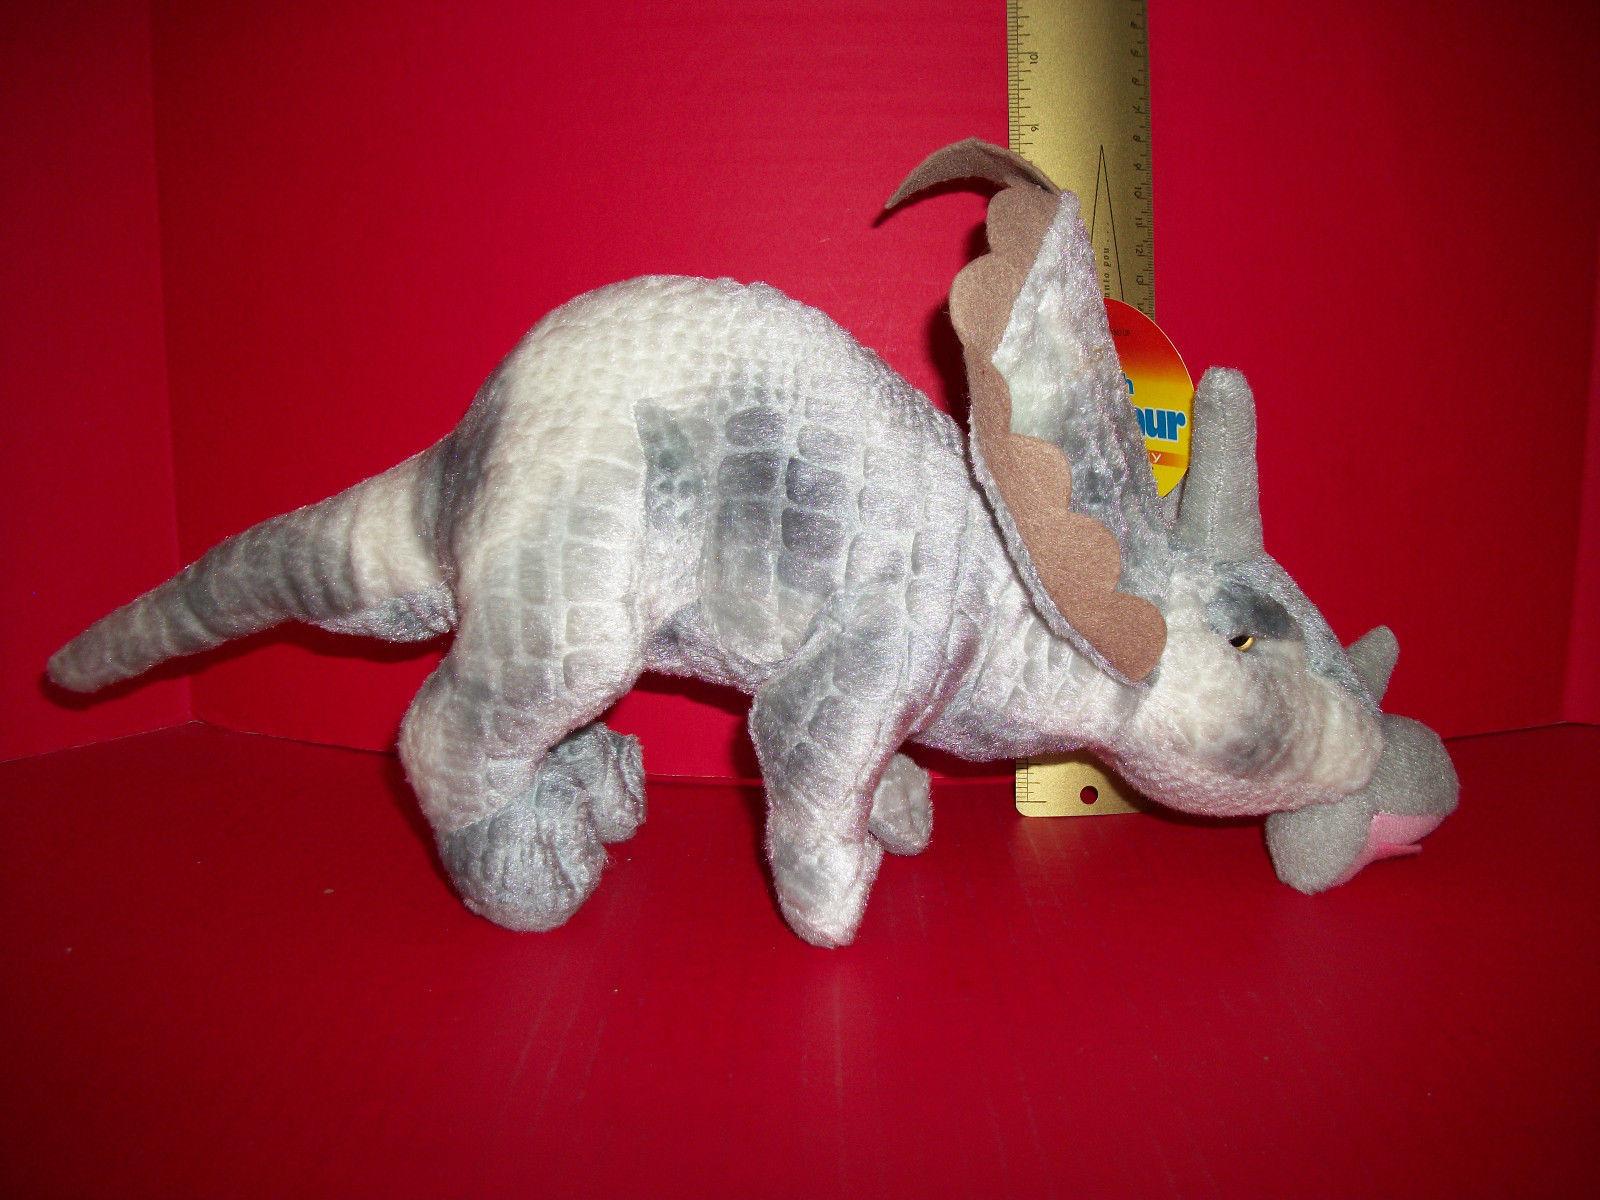 Toy Gift Gray Dinosaur Plush Kids Stuff Prehistoric Soft Body Stuffed Animal New